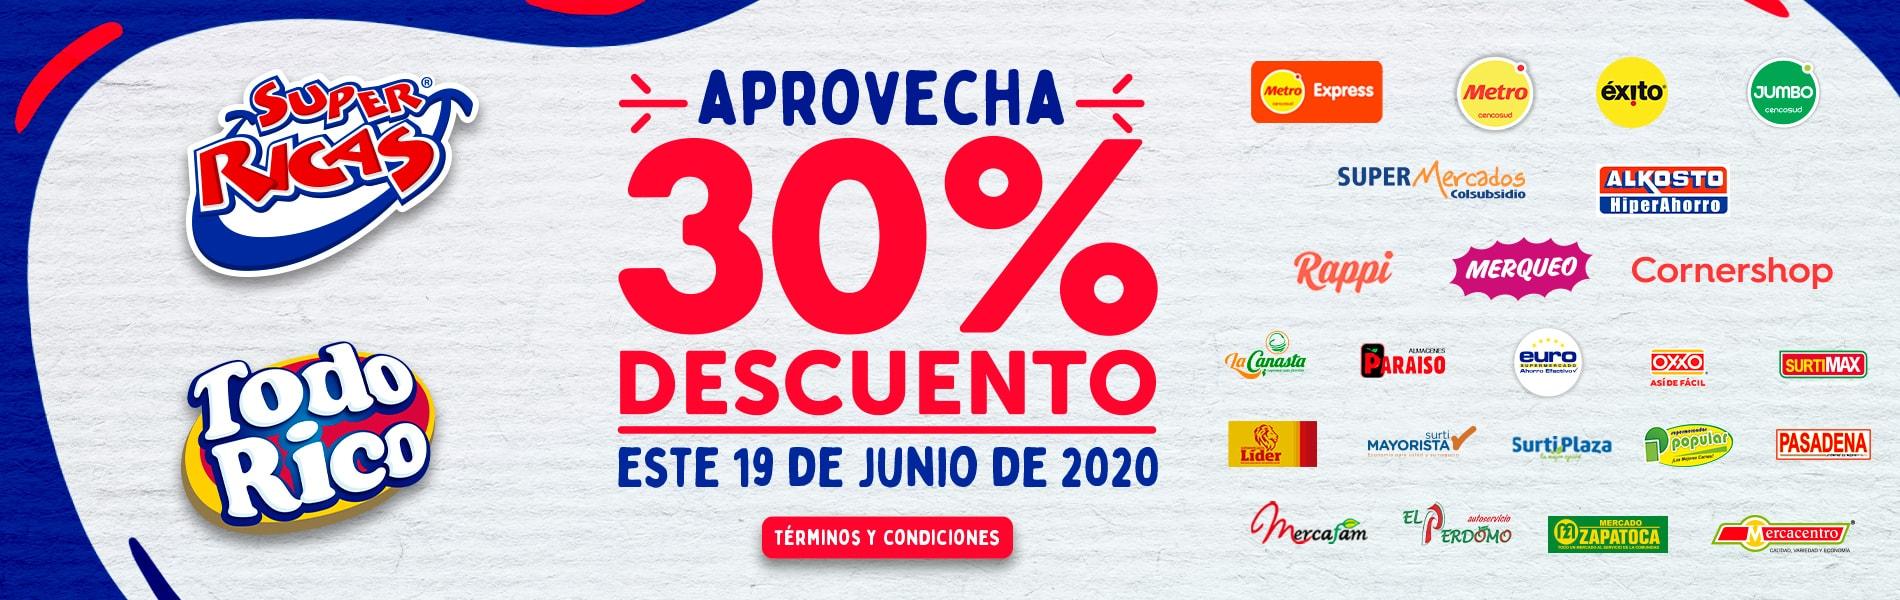 Slide Descuento 30%